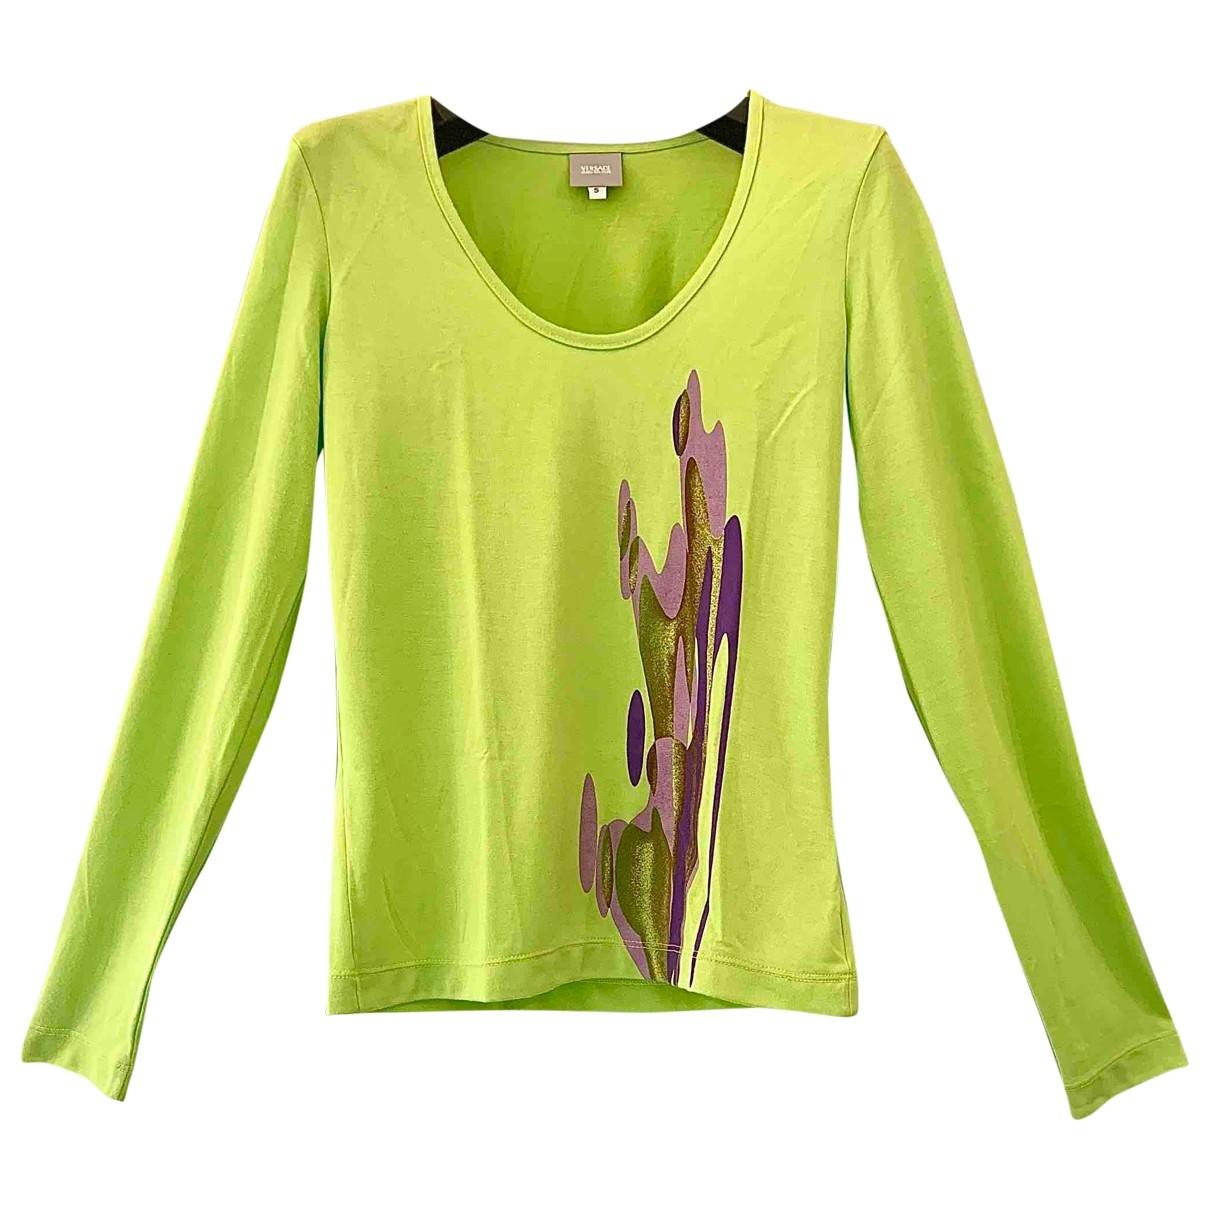 Versace Jeans \N Green Cotton  top for Women S International